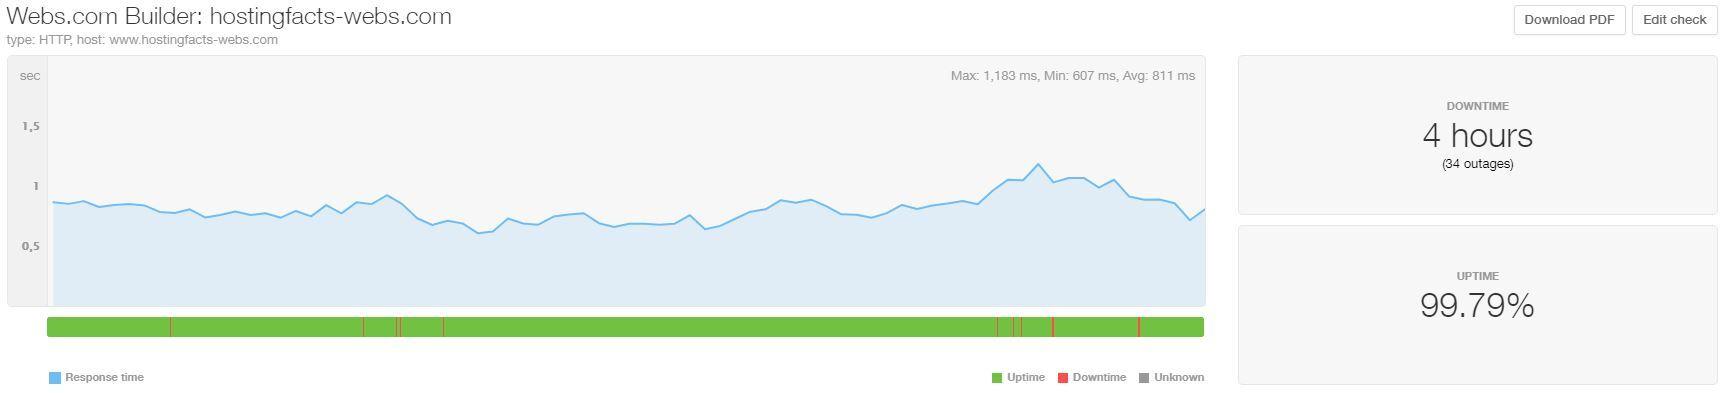 Webs uptime and speed April-June